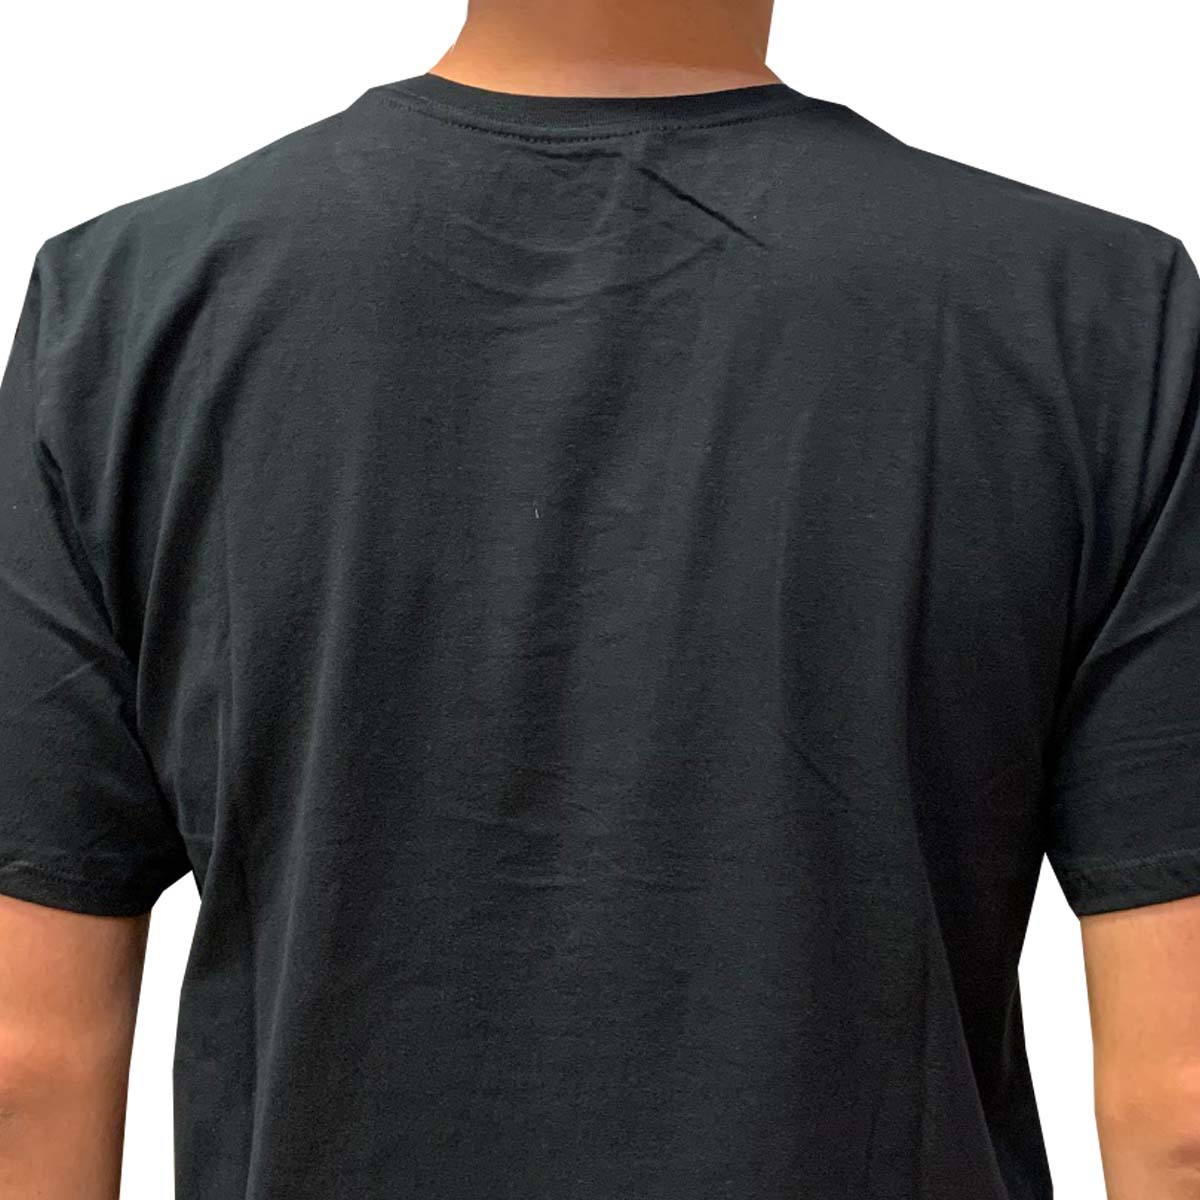 Camiseta Hurley Heat 641002l18 Masculina 64102